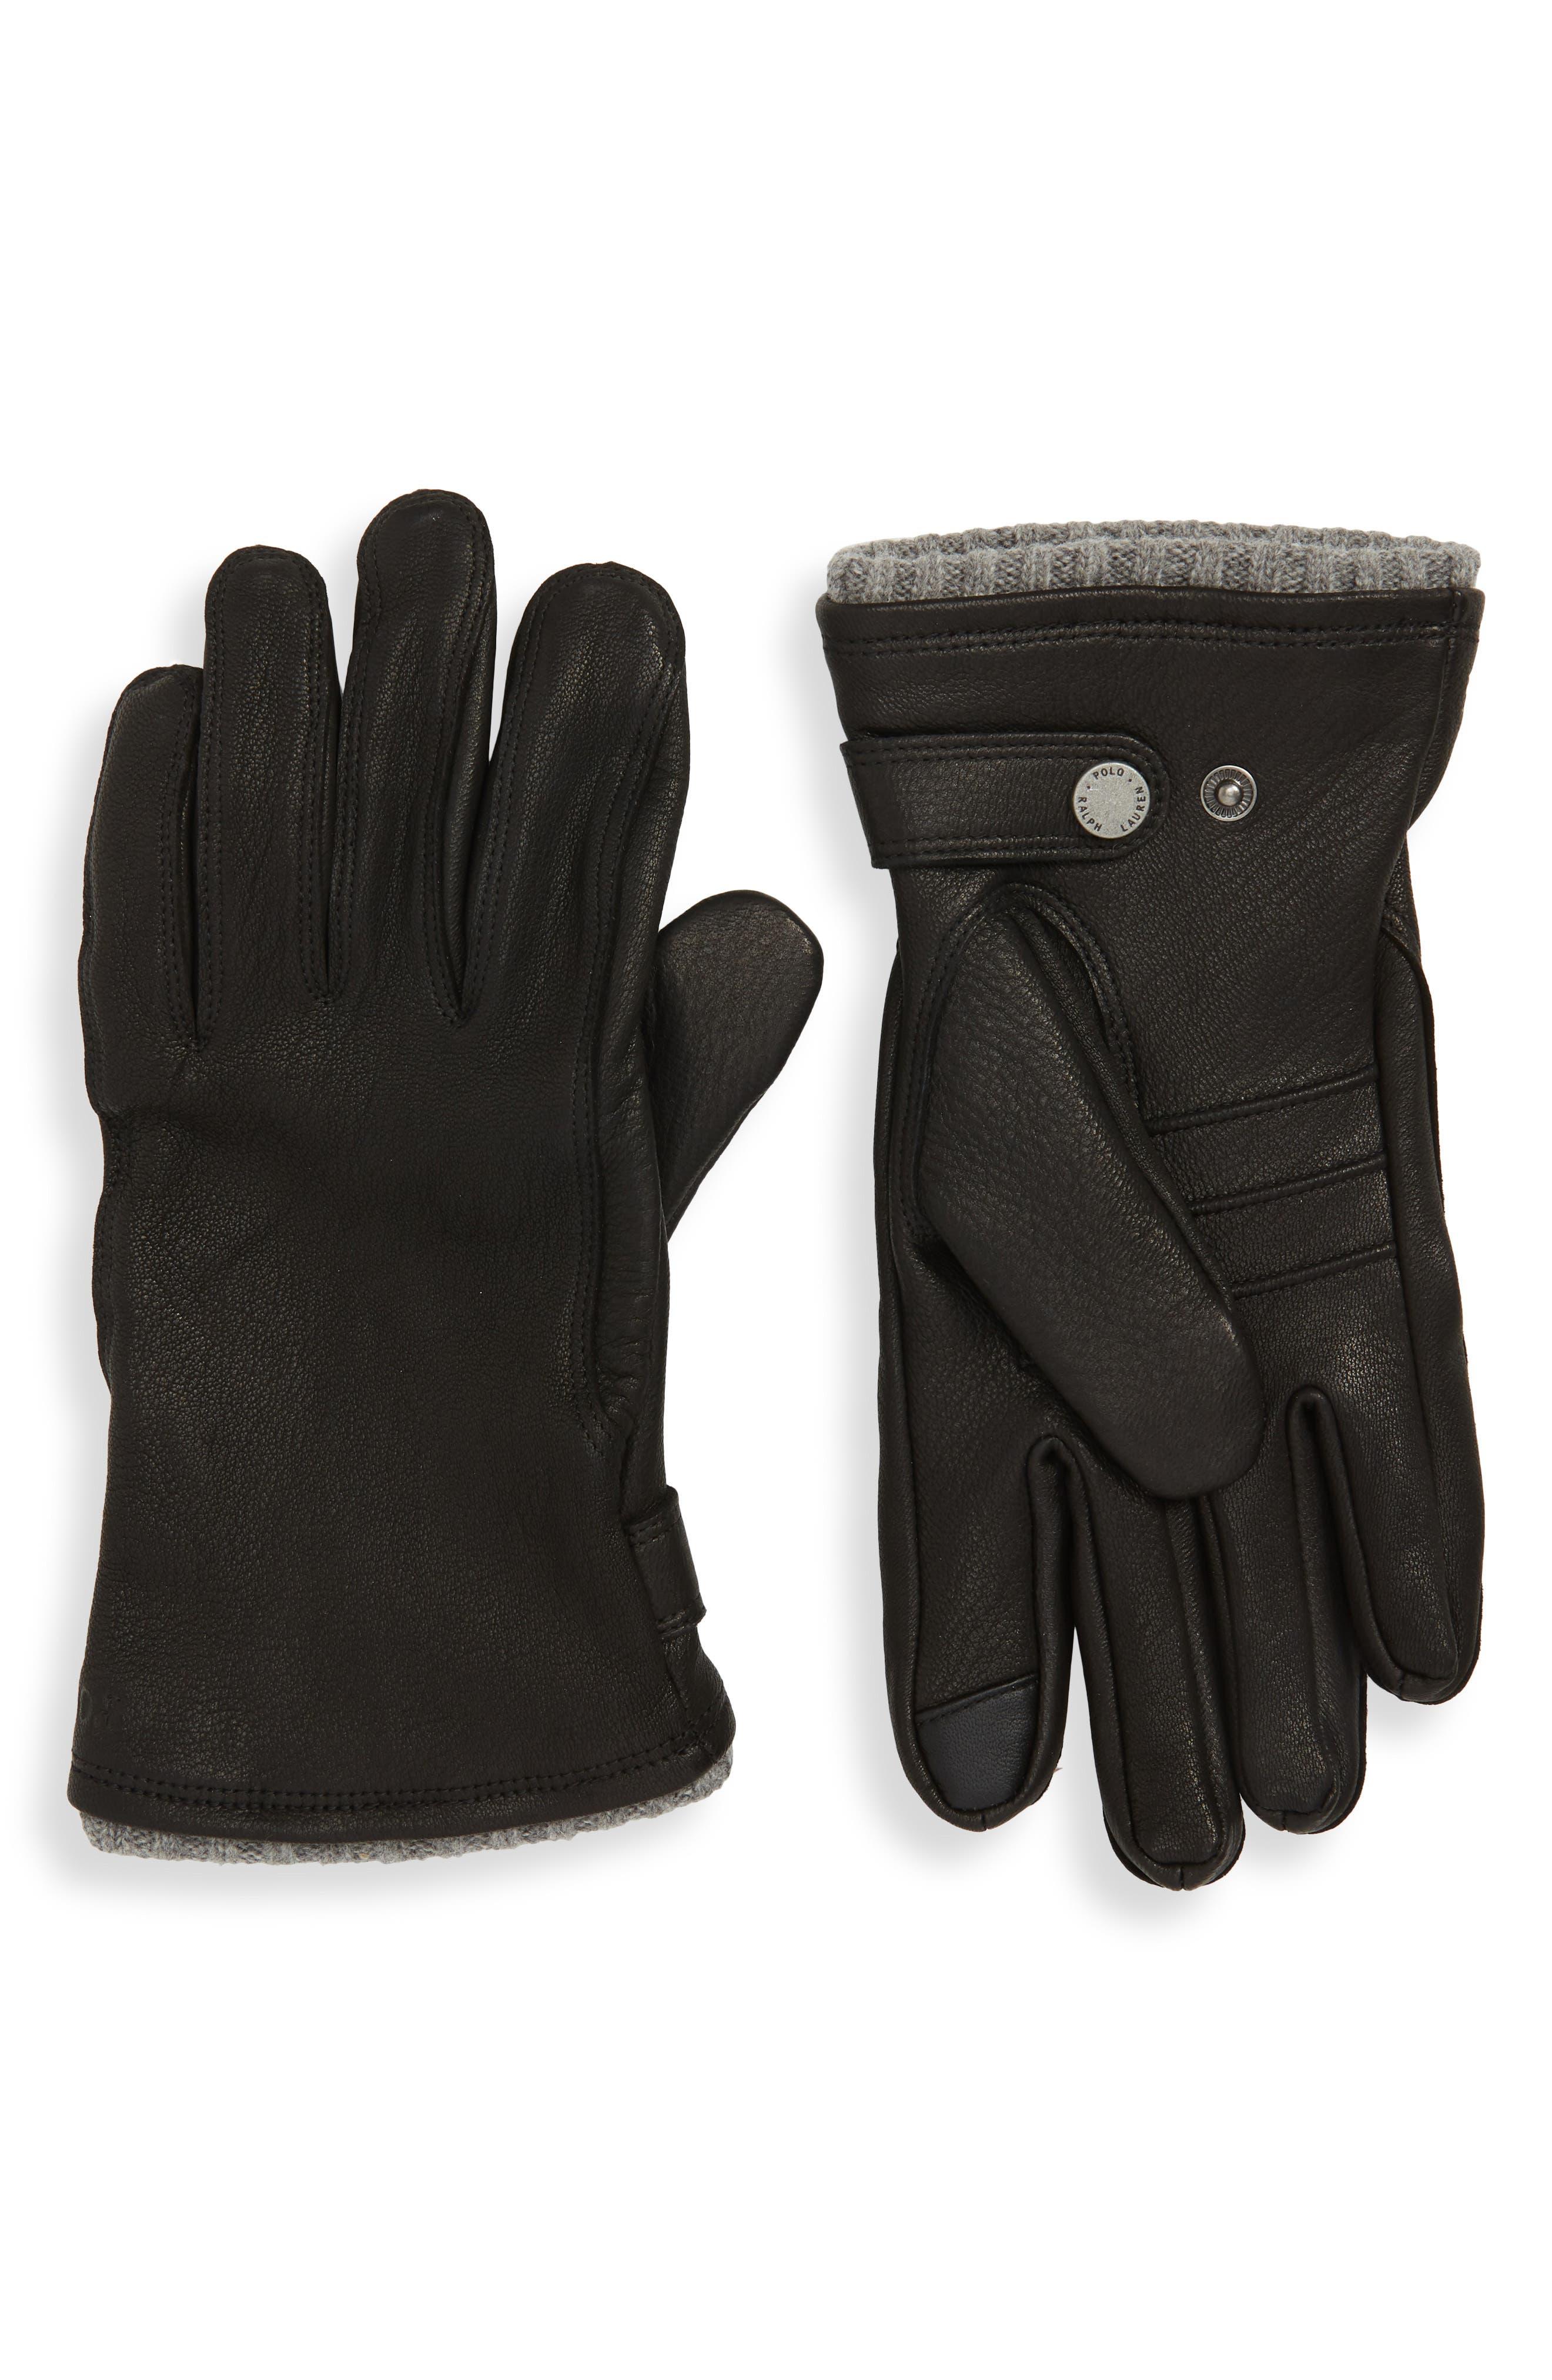 POLO RALPH LAUREN Deerskin Gloves, Main, color, BLACK